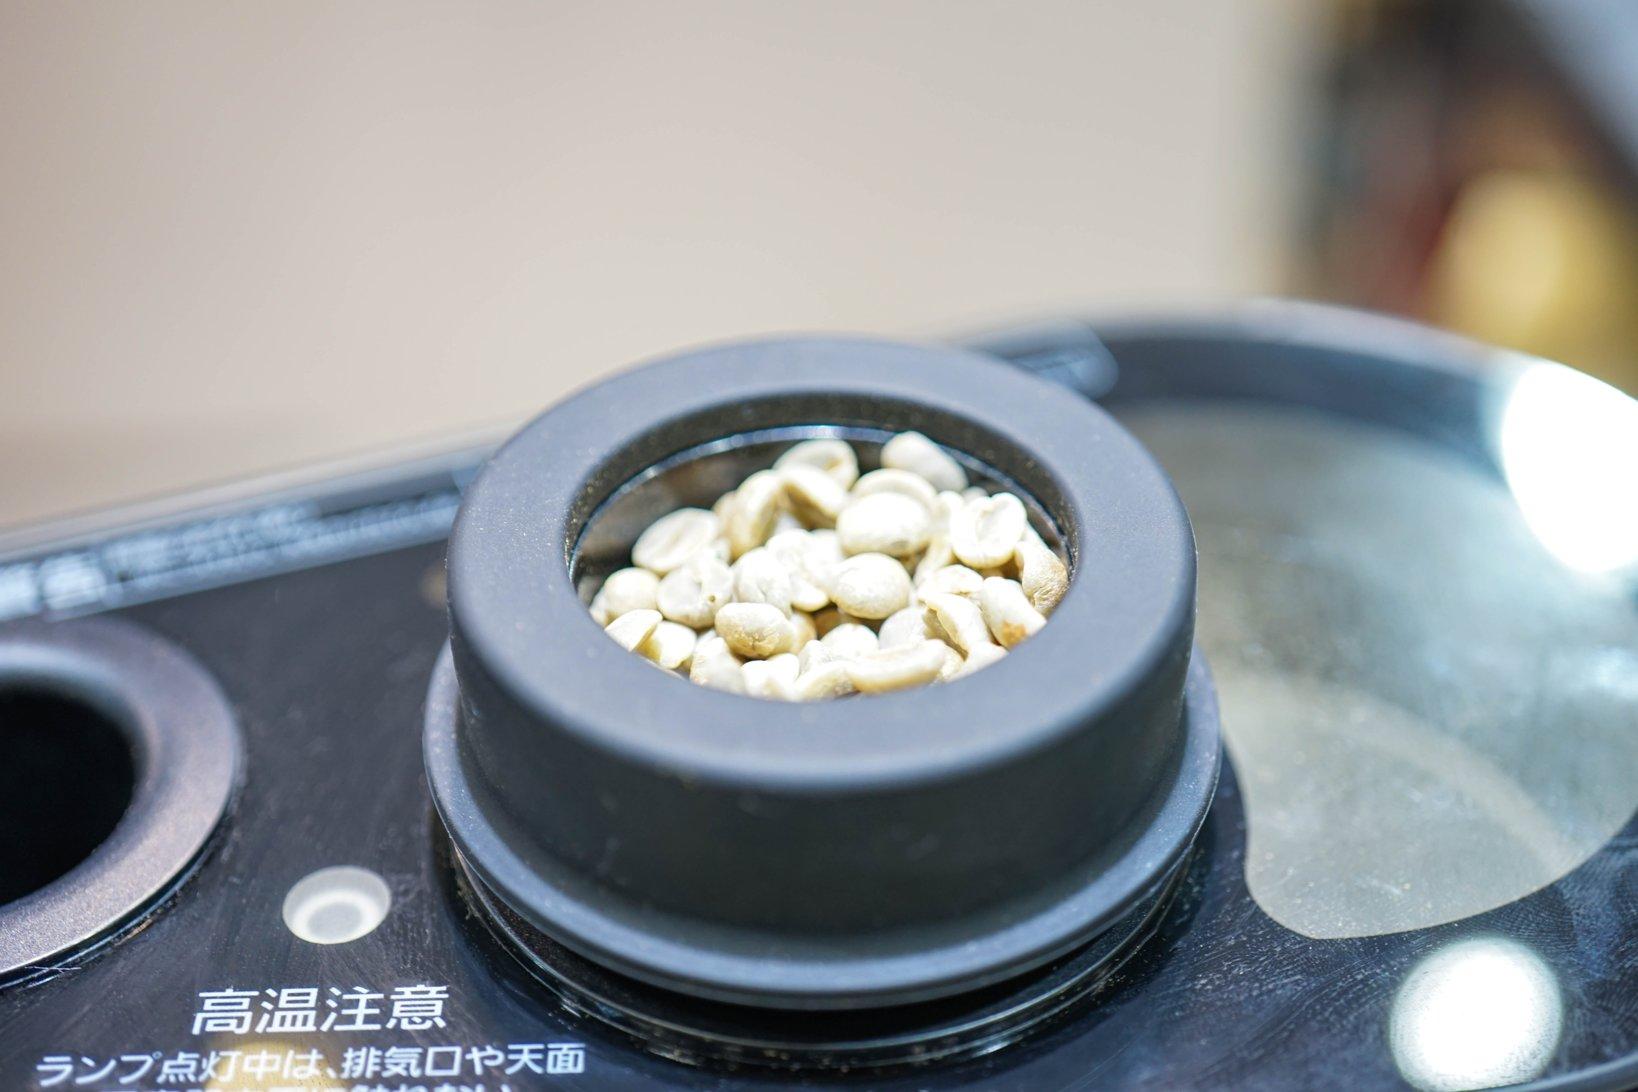 The Roast 焙煎機にセットされた生豆